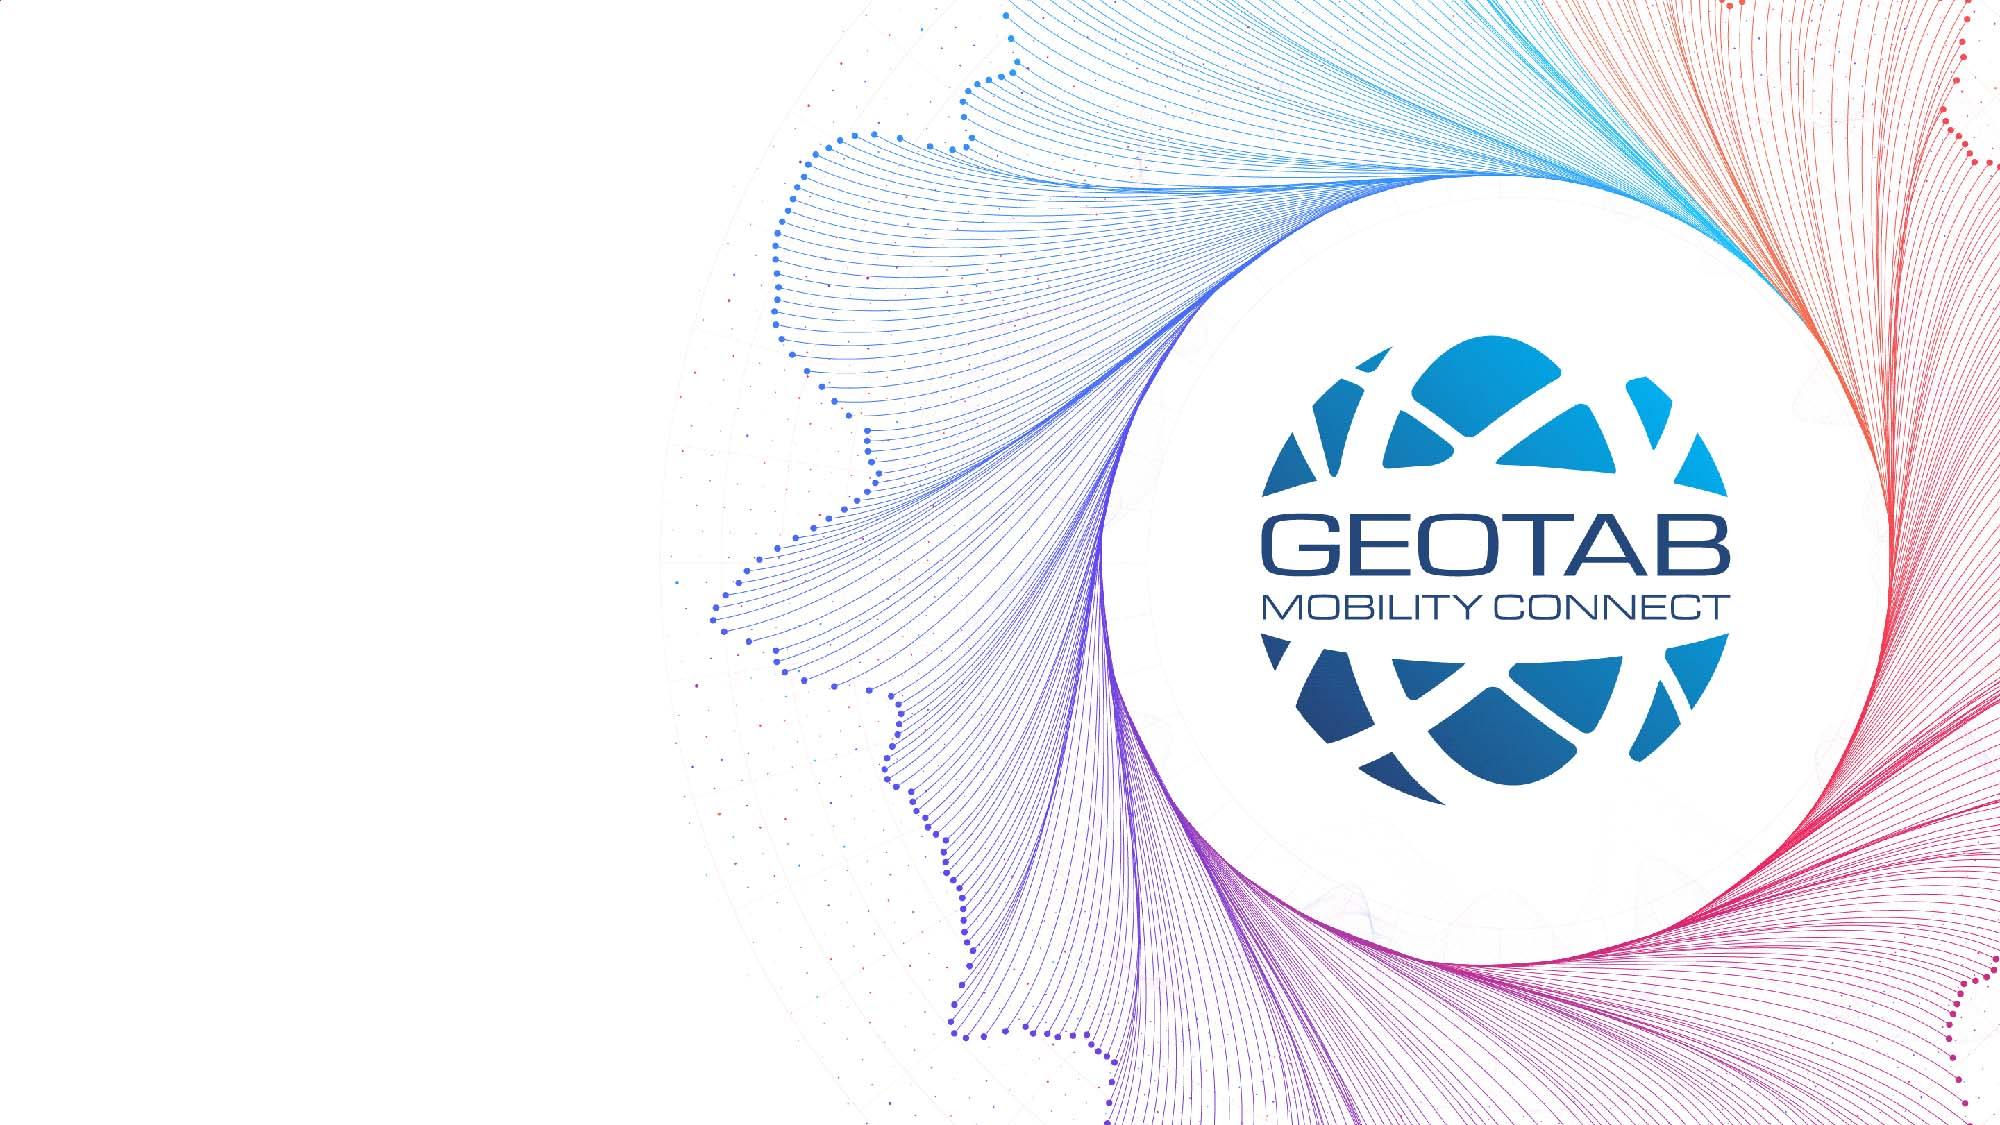 Logo de Mobility Connect 2020